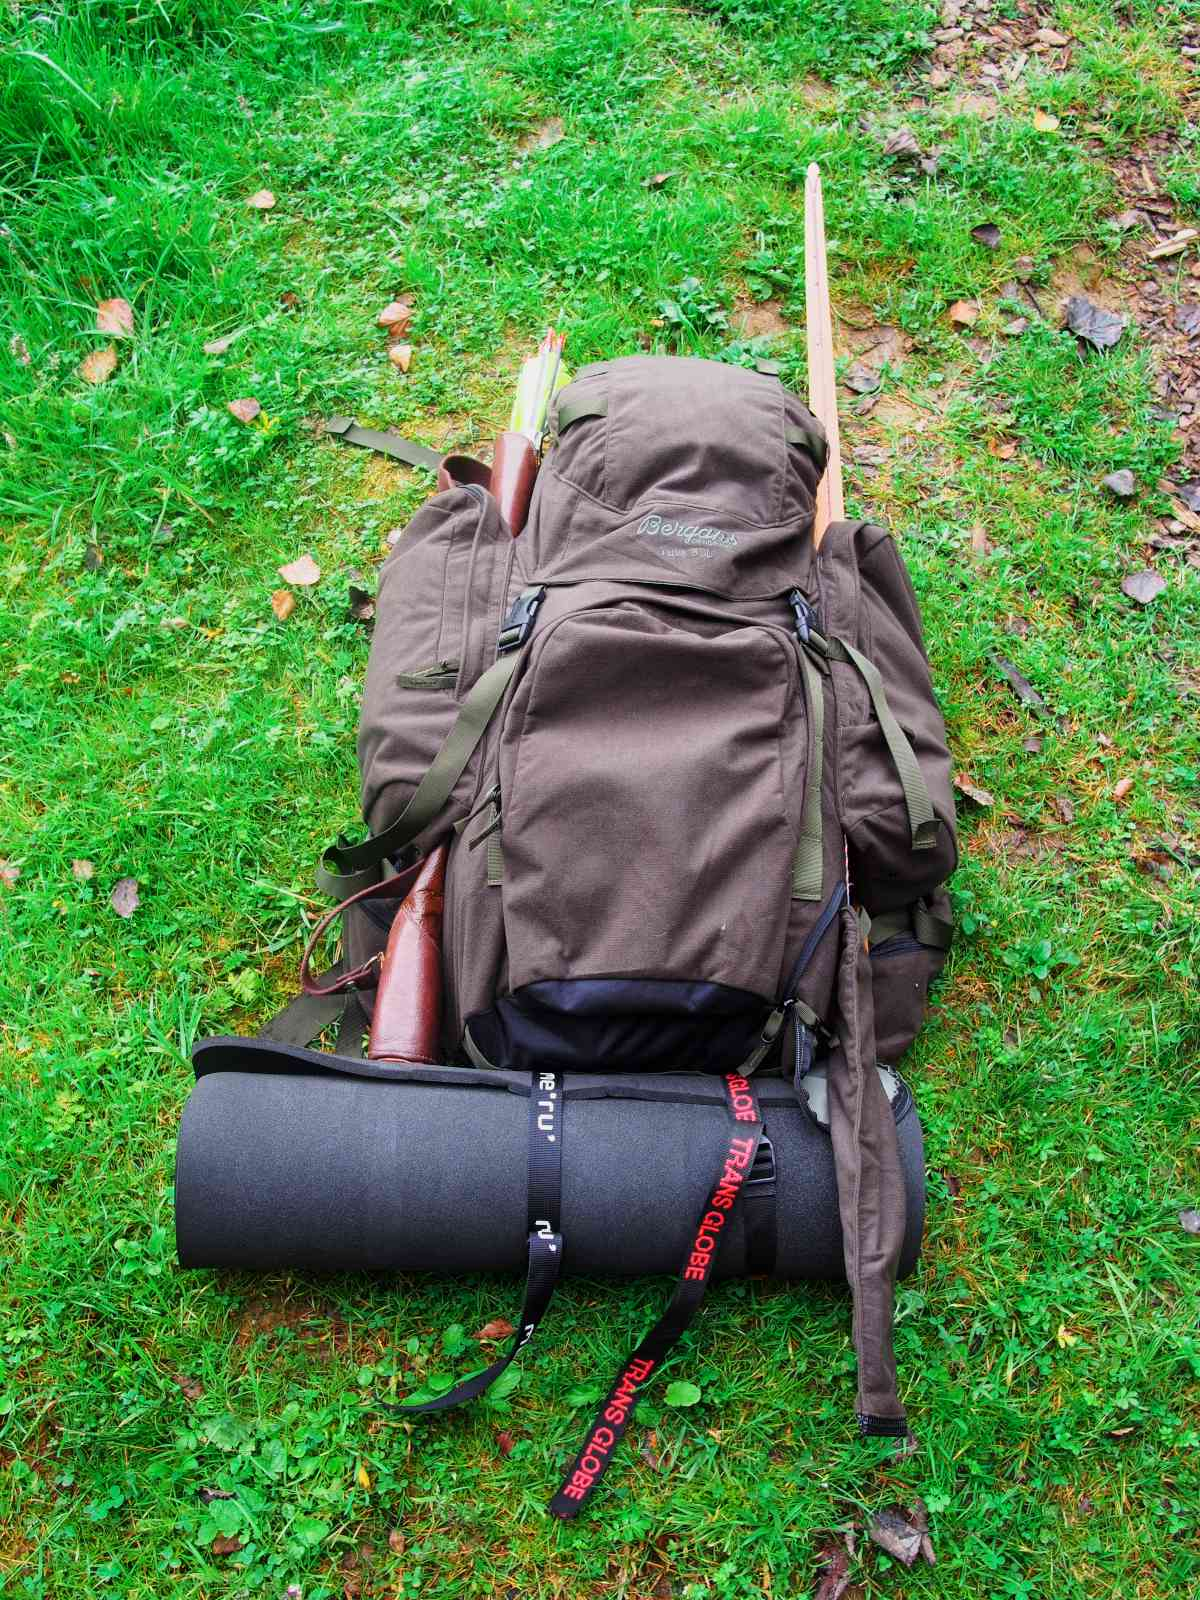 Bergans Tuva Huntpack - Material ist leise saugt sich aber voll Regen